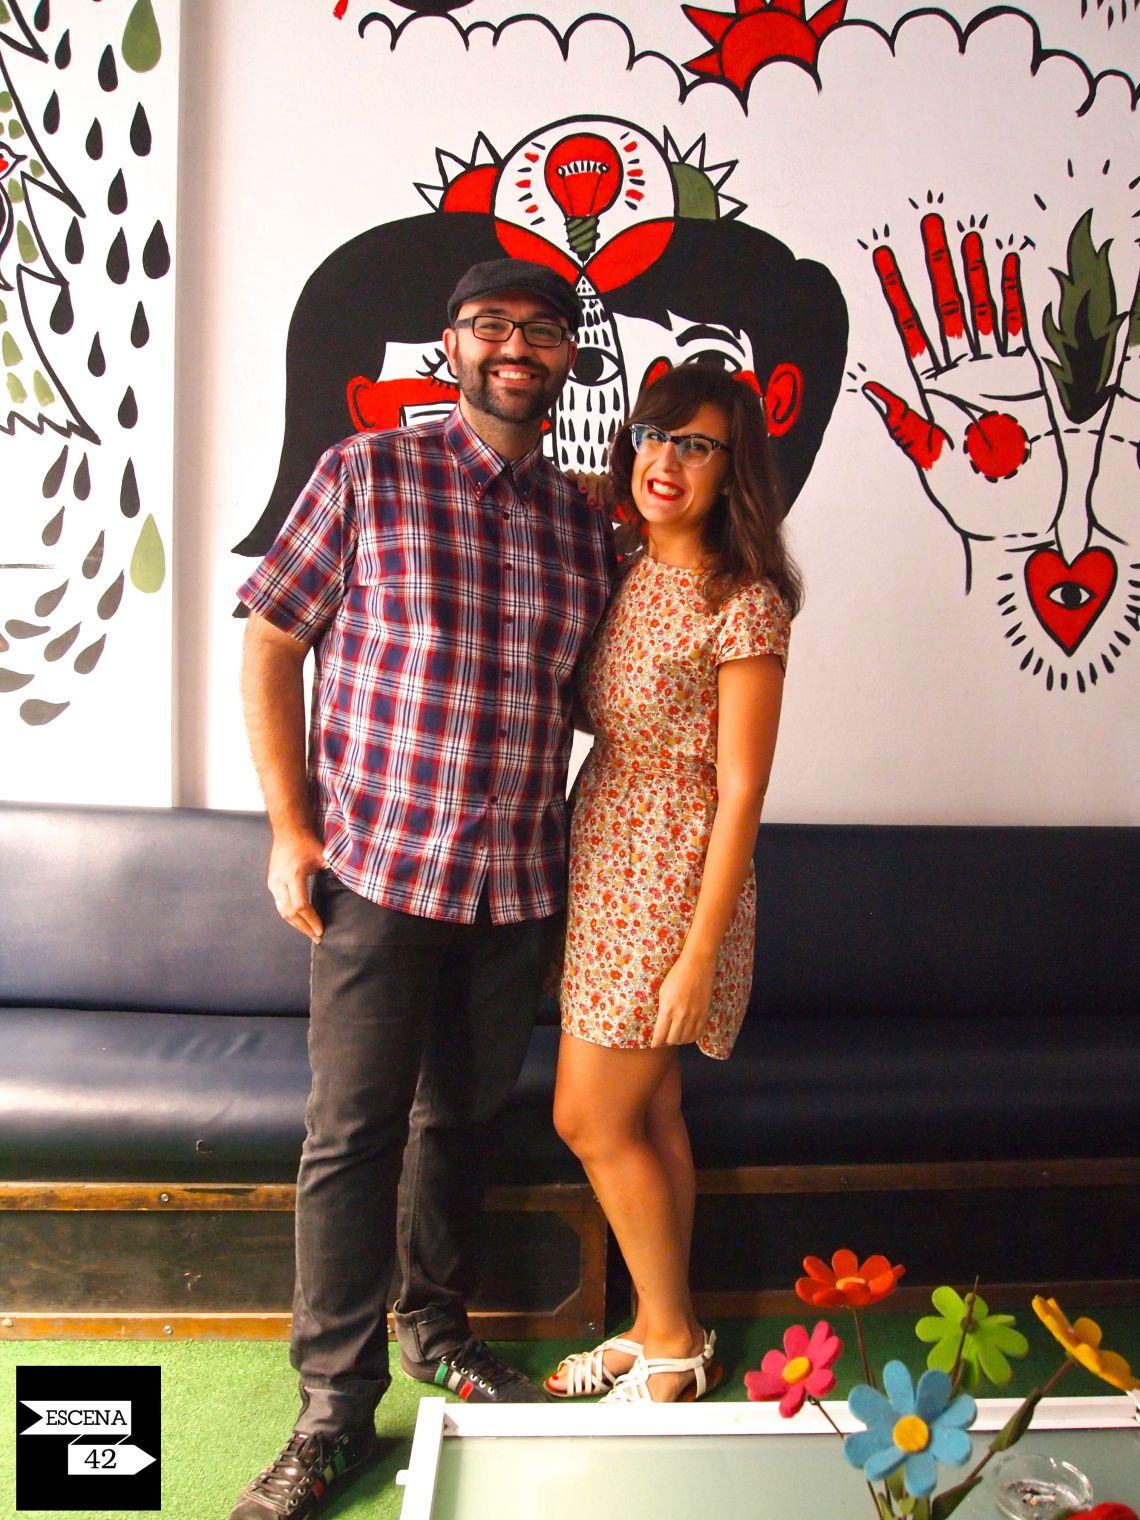 Santi y Noelia integrantes de Capitán Sunrise